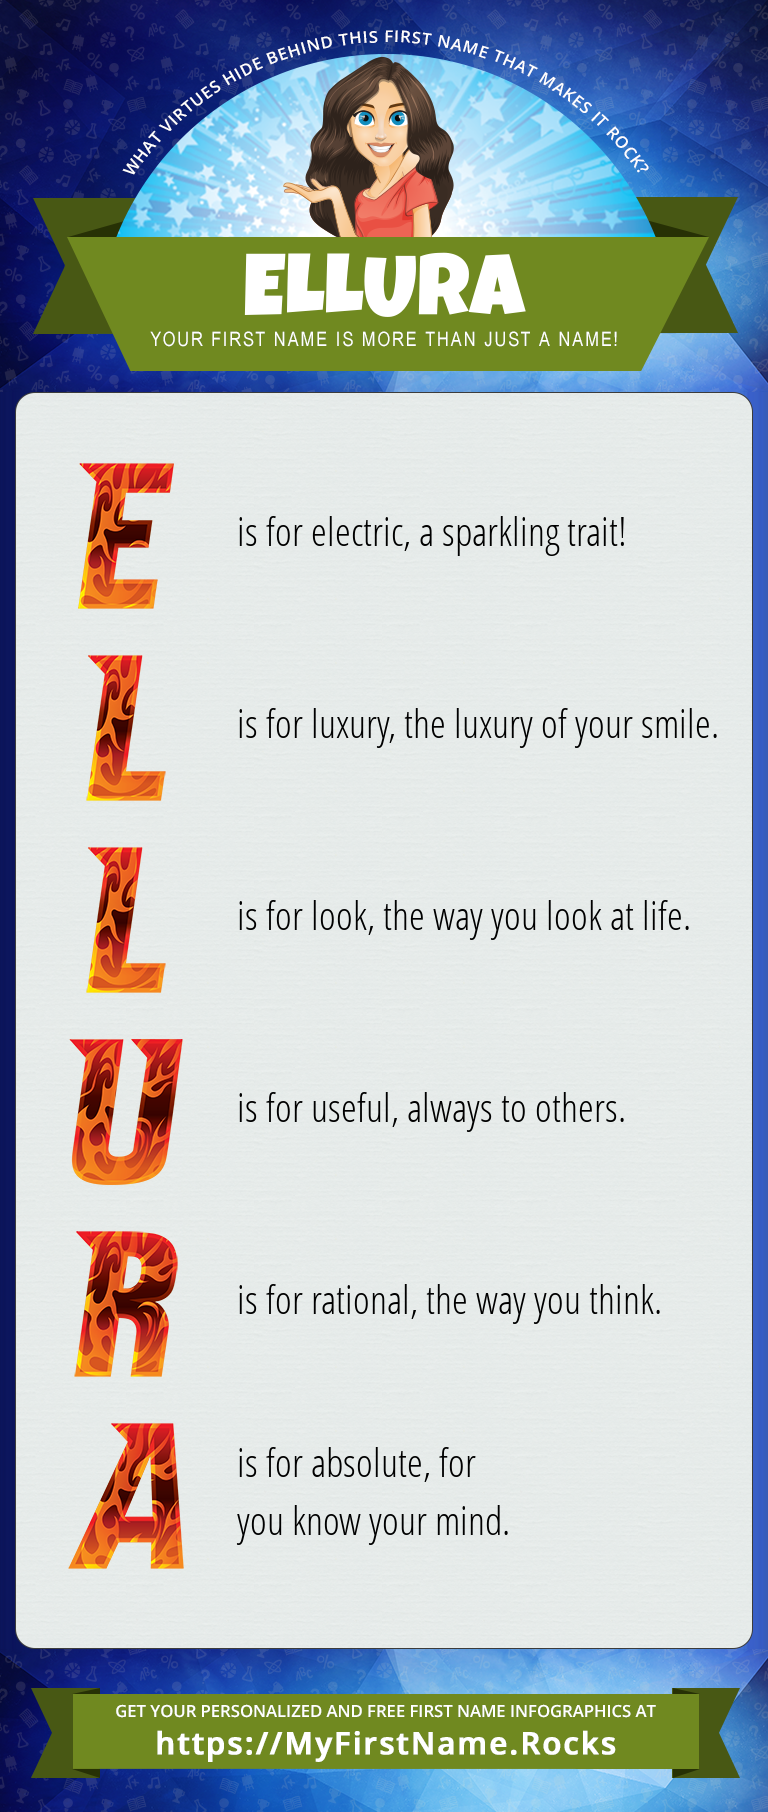 Ellura Infographics